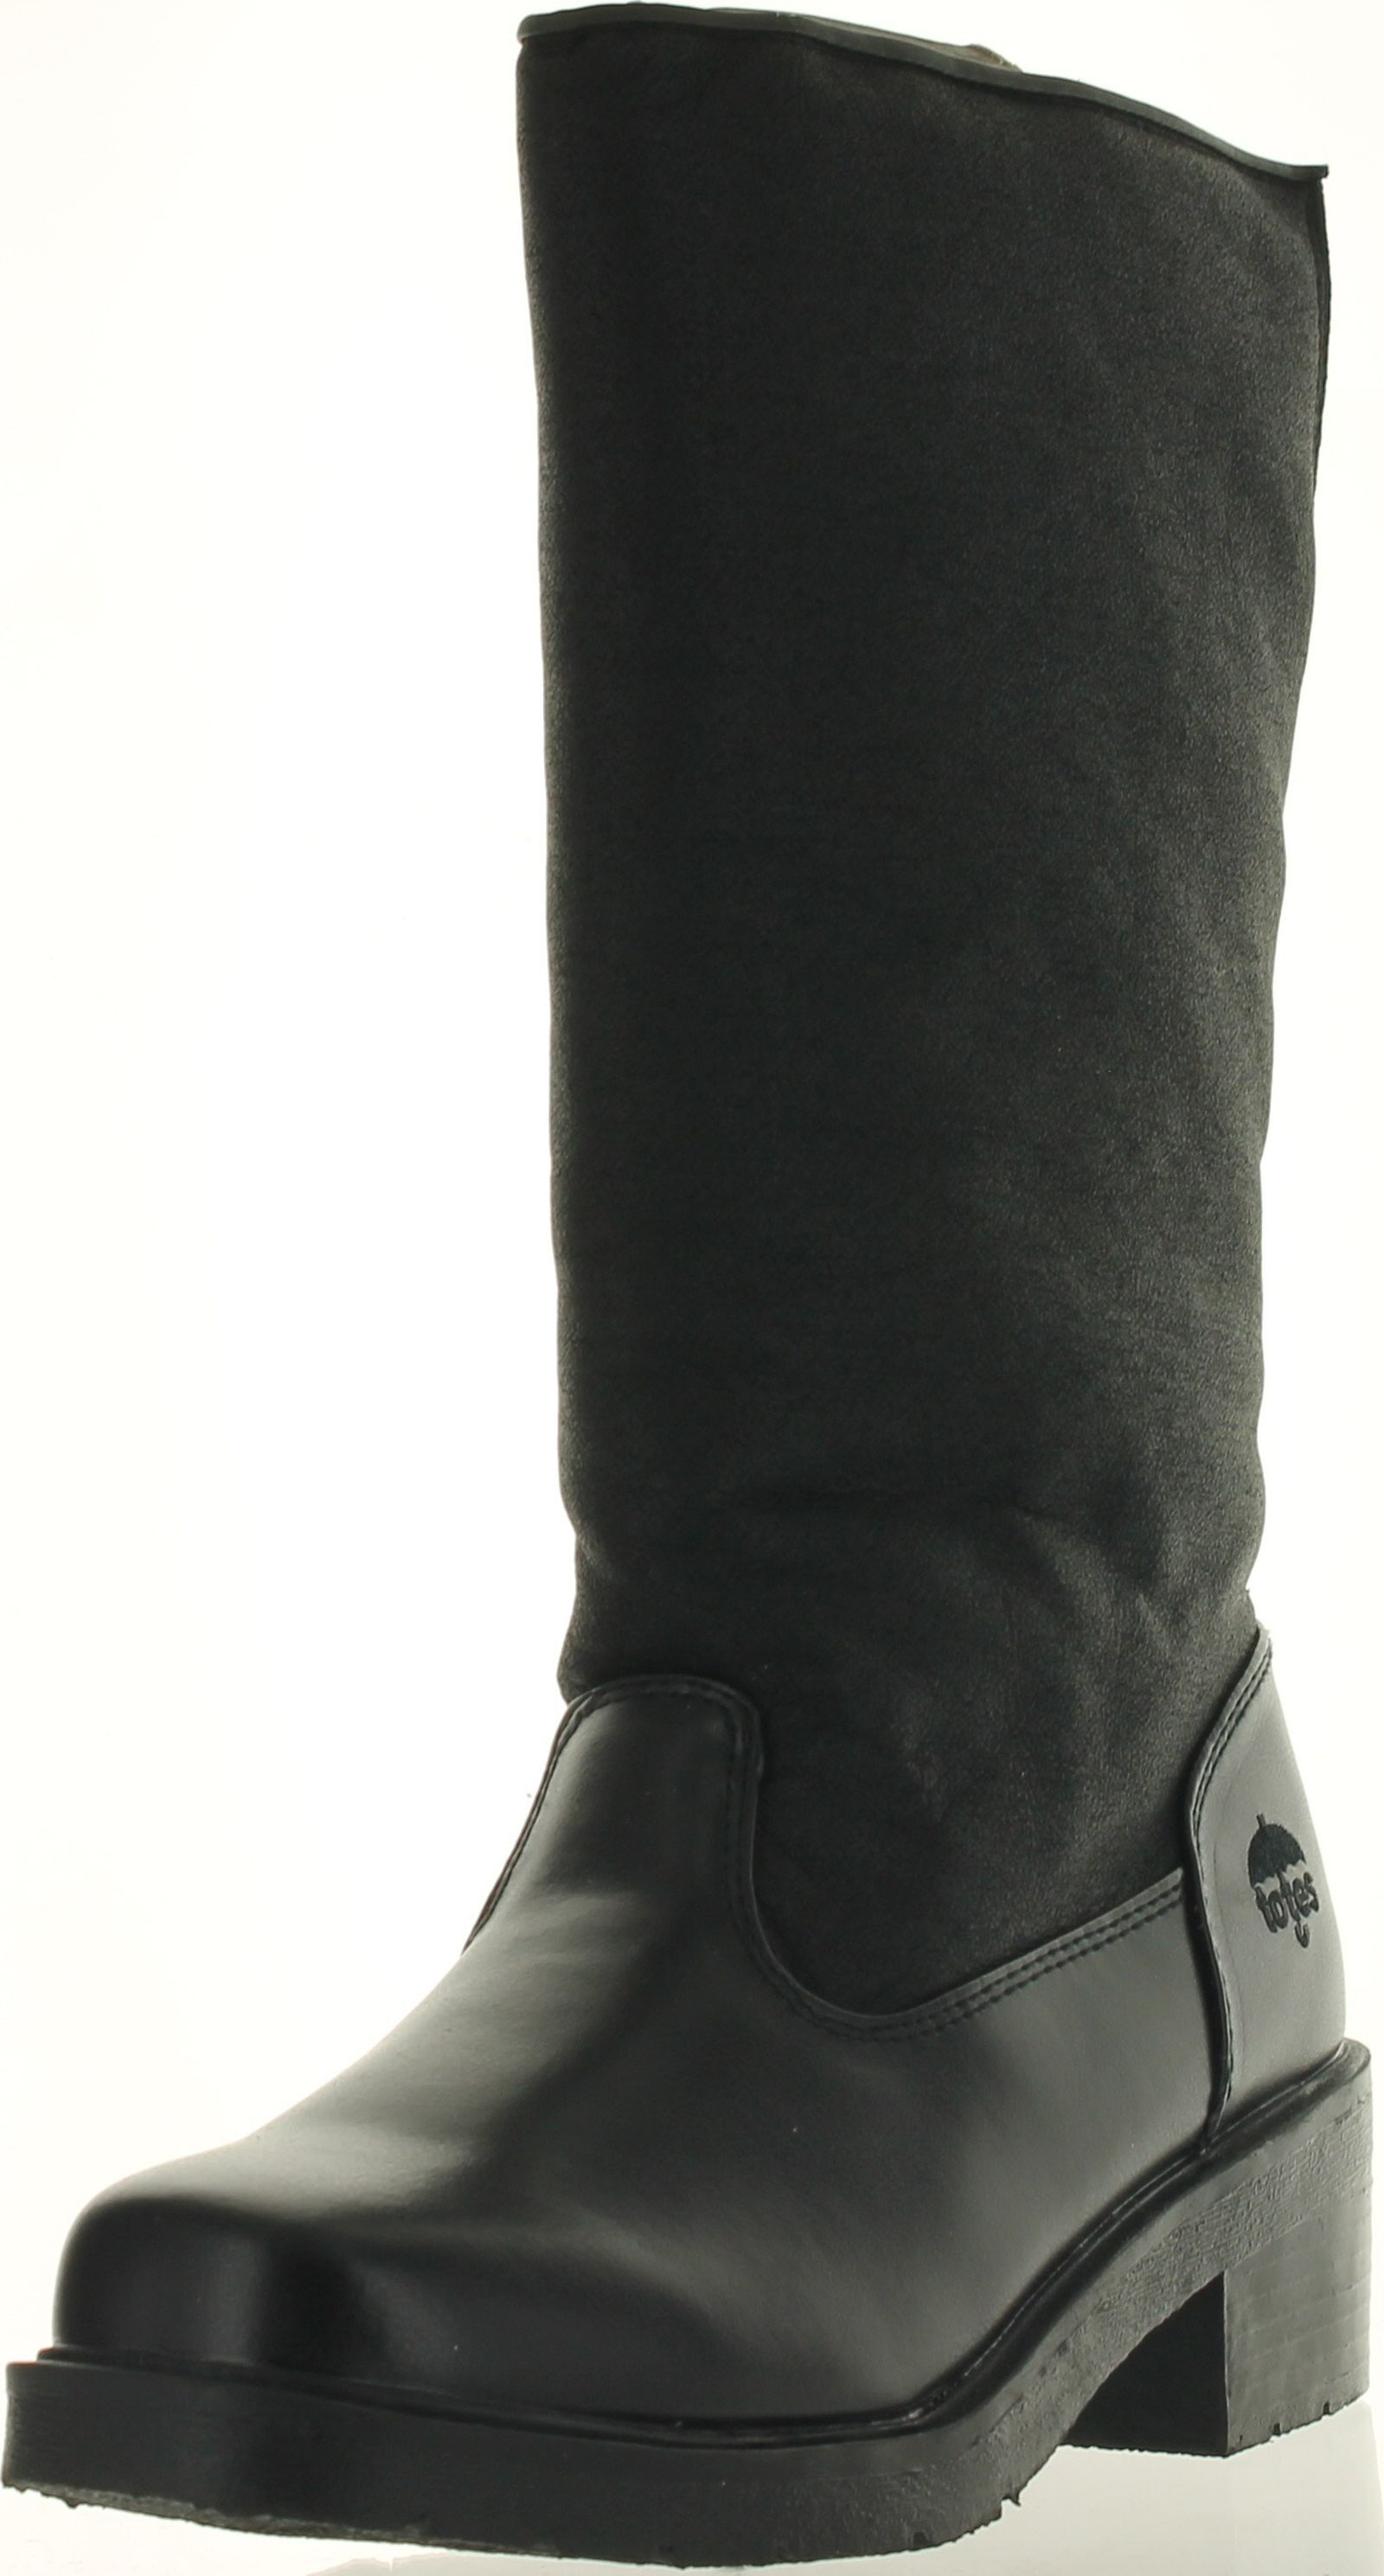 Totes Womens Paula Waterproof Winter Snow Boots | eBay